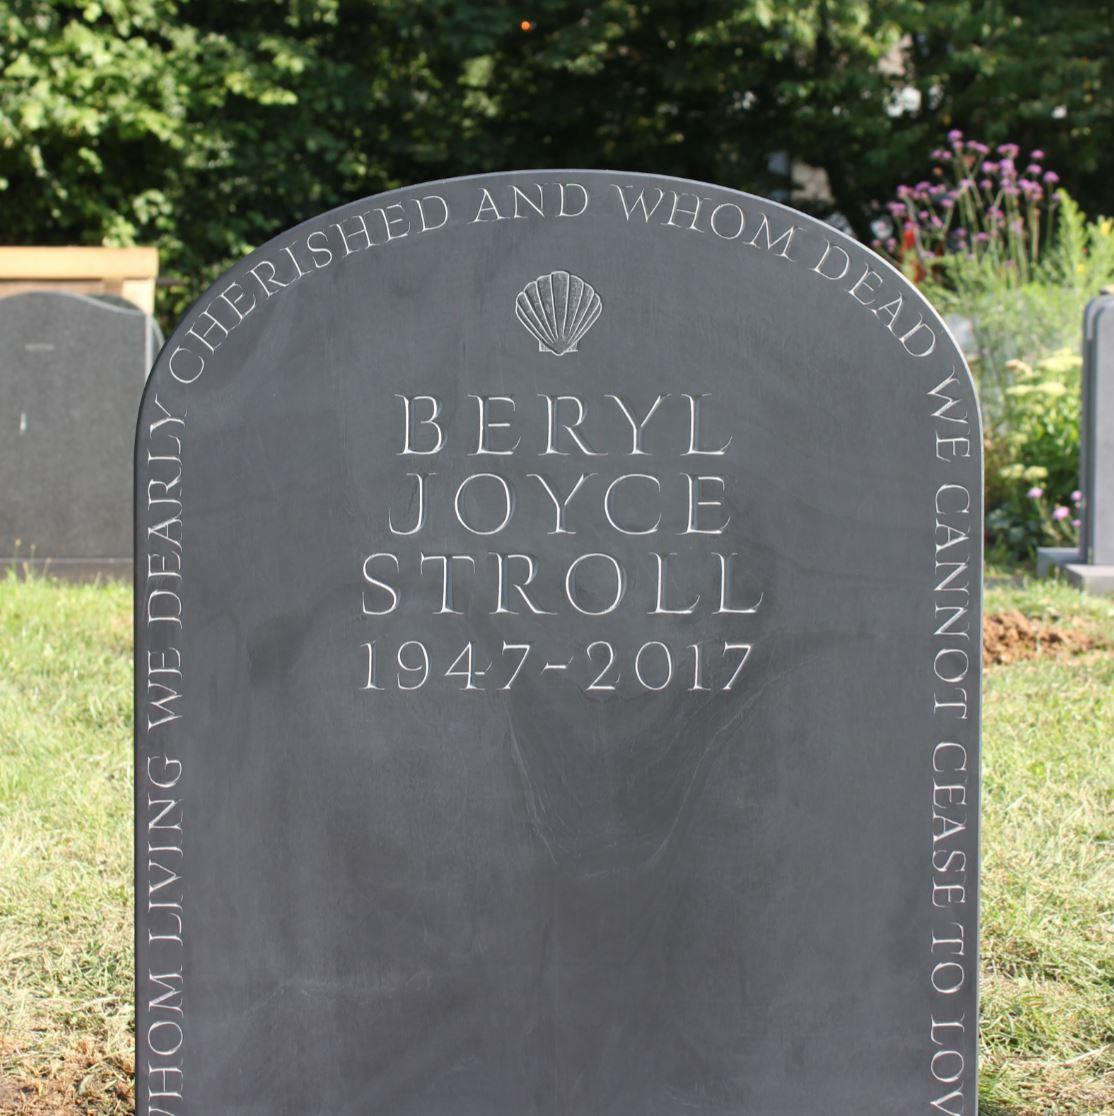 Headstones Gravestones and Memorials